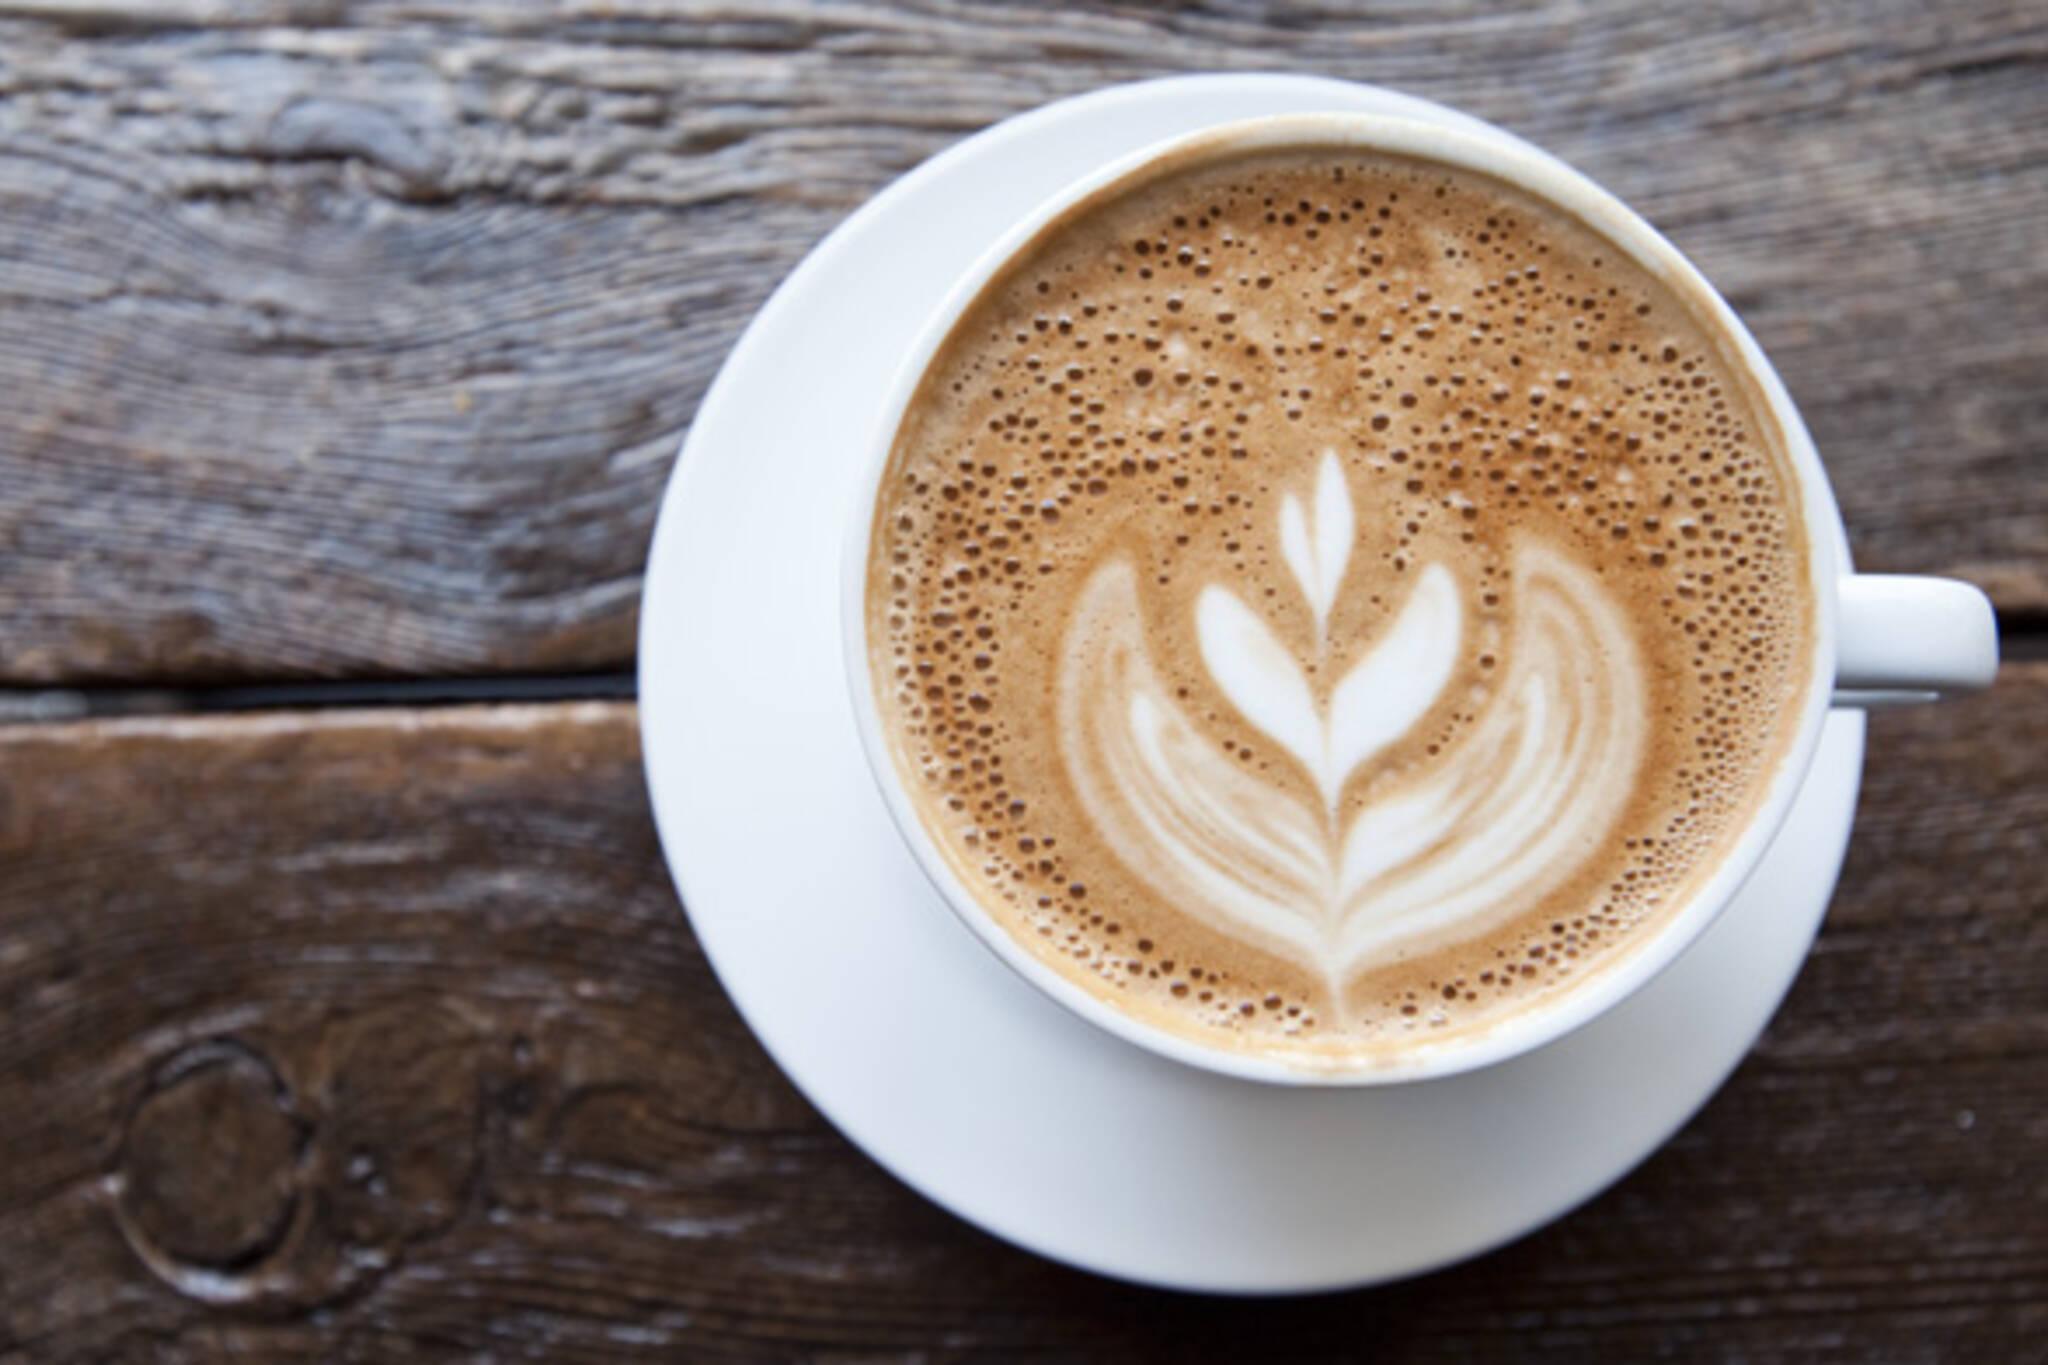 toronto free coffee